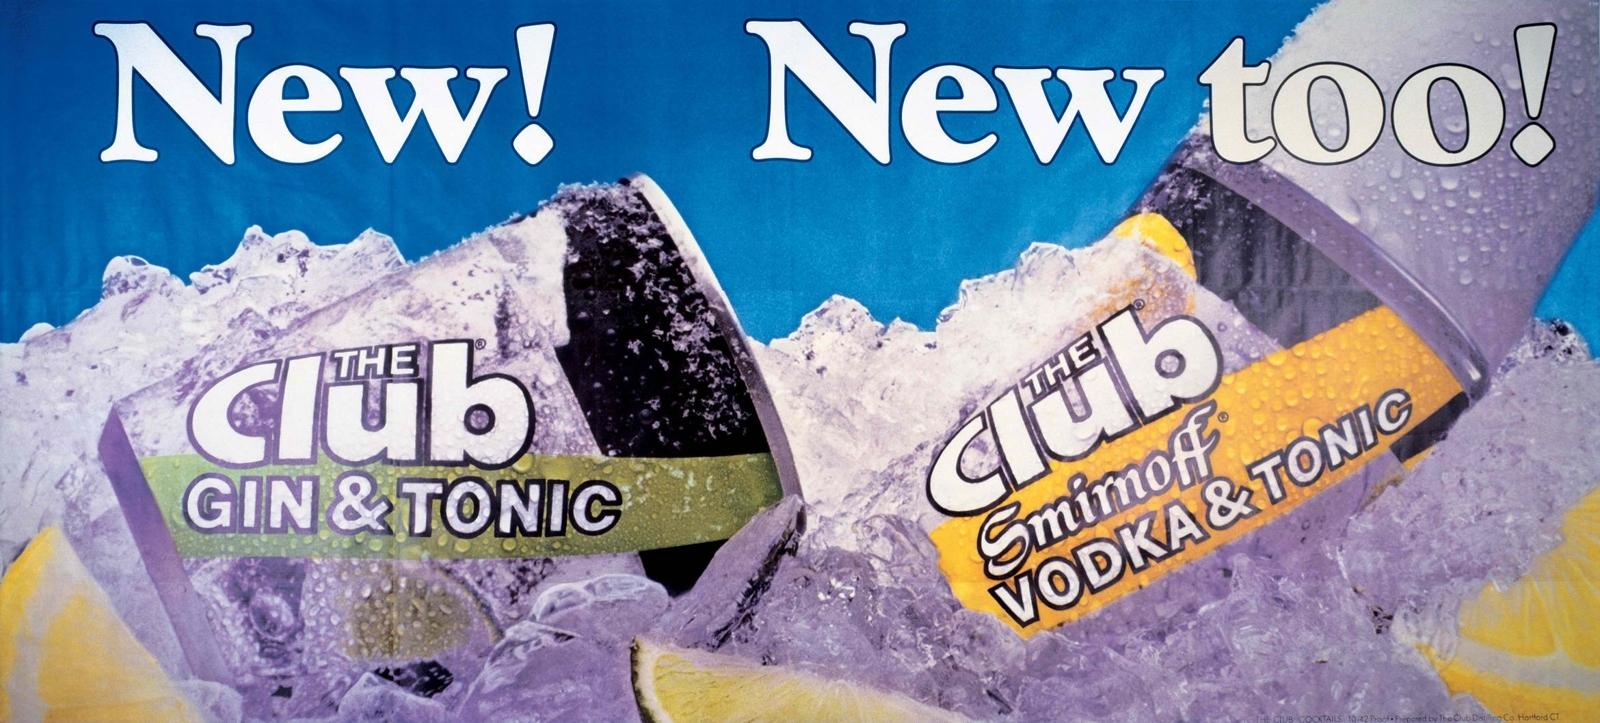 Jeff Koons: New New Too! image